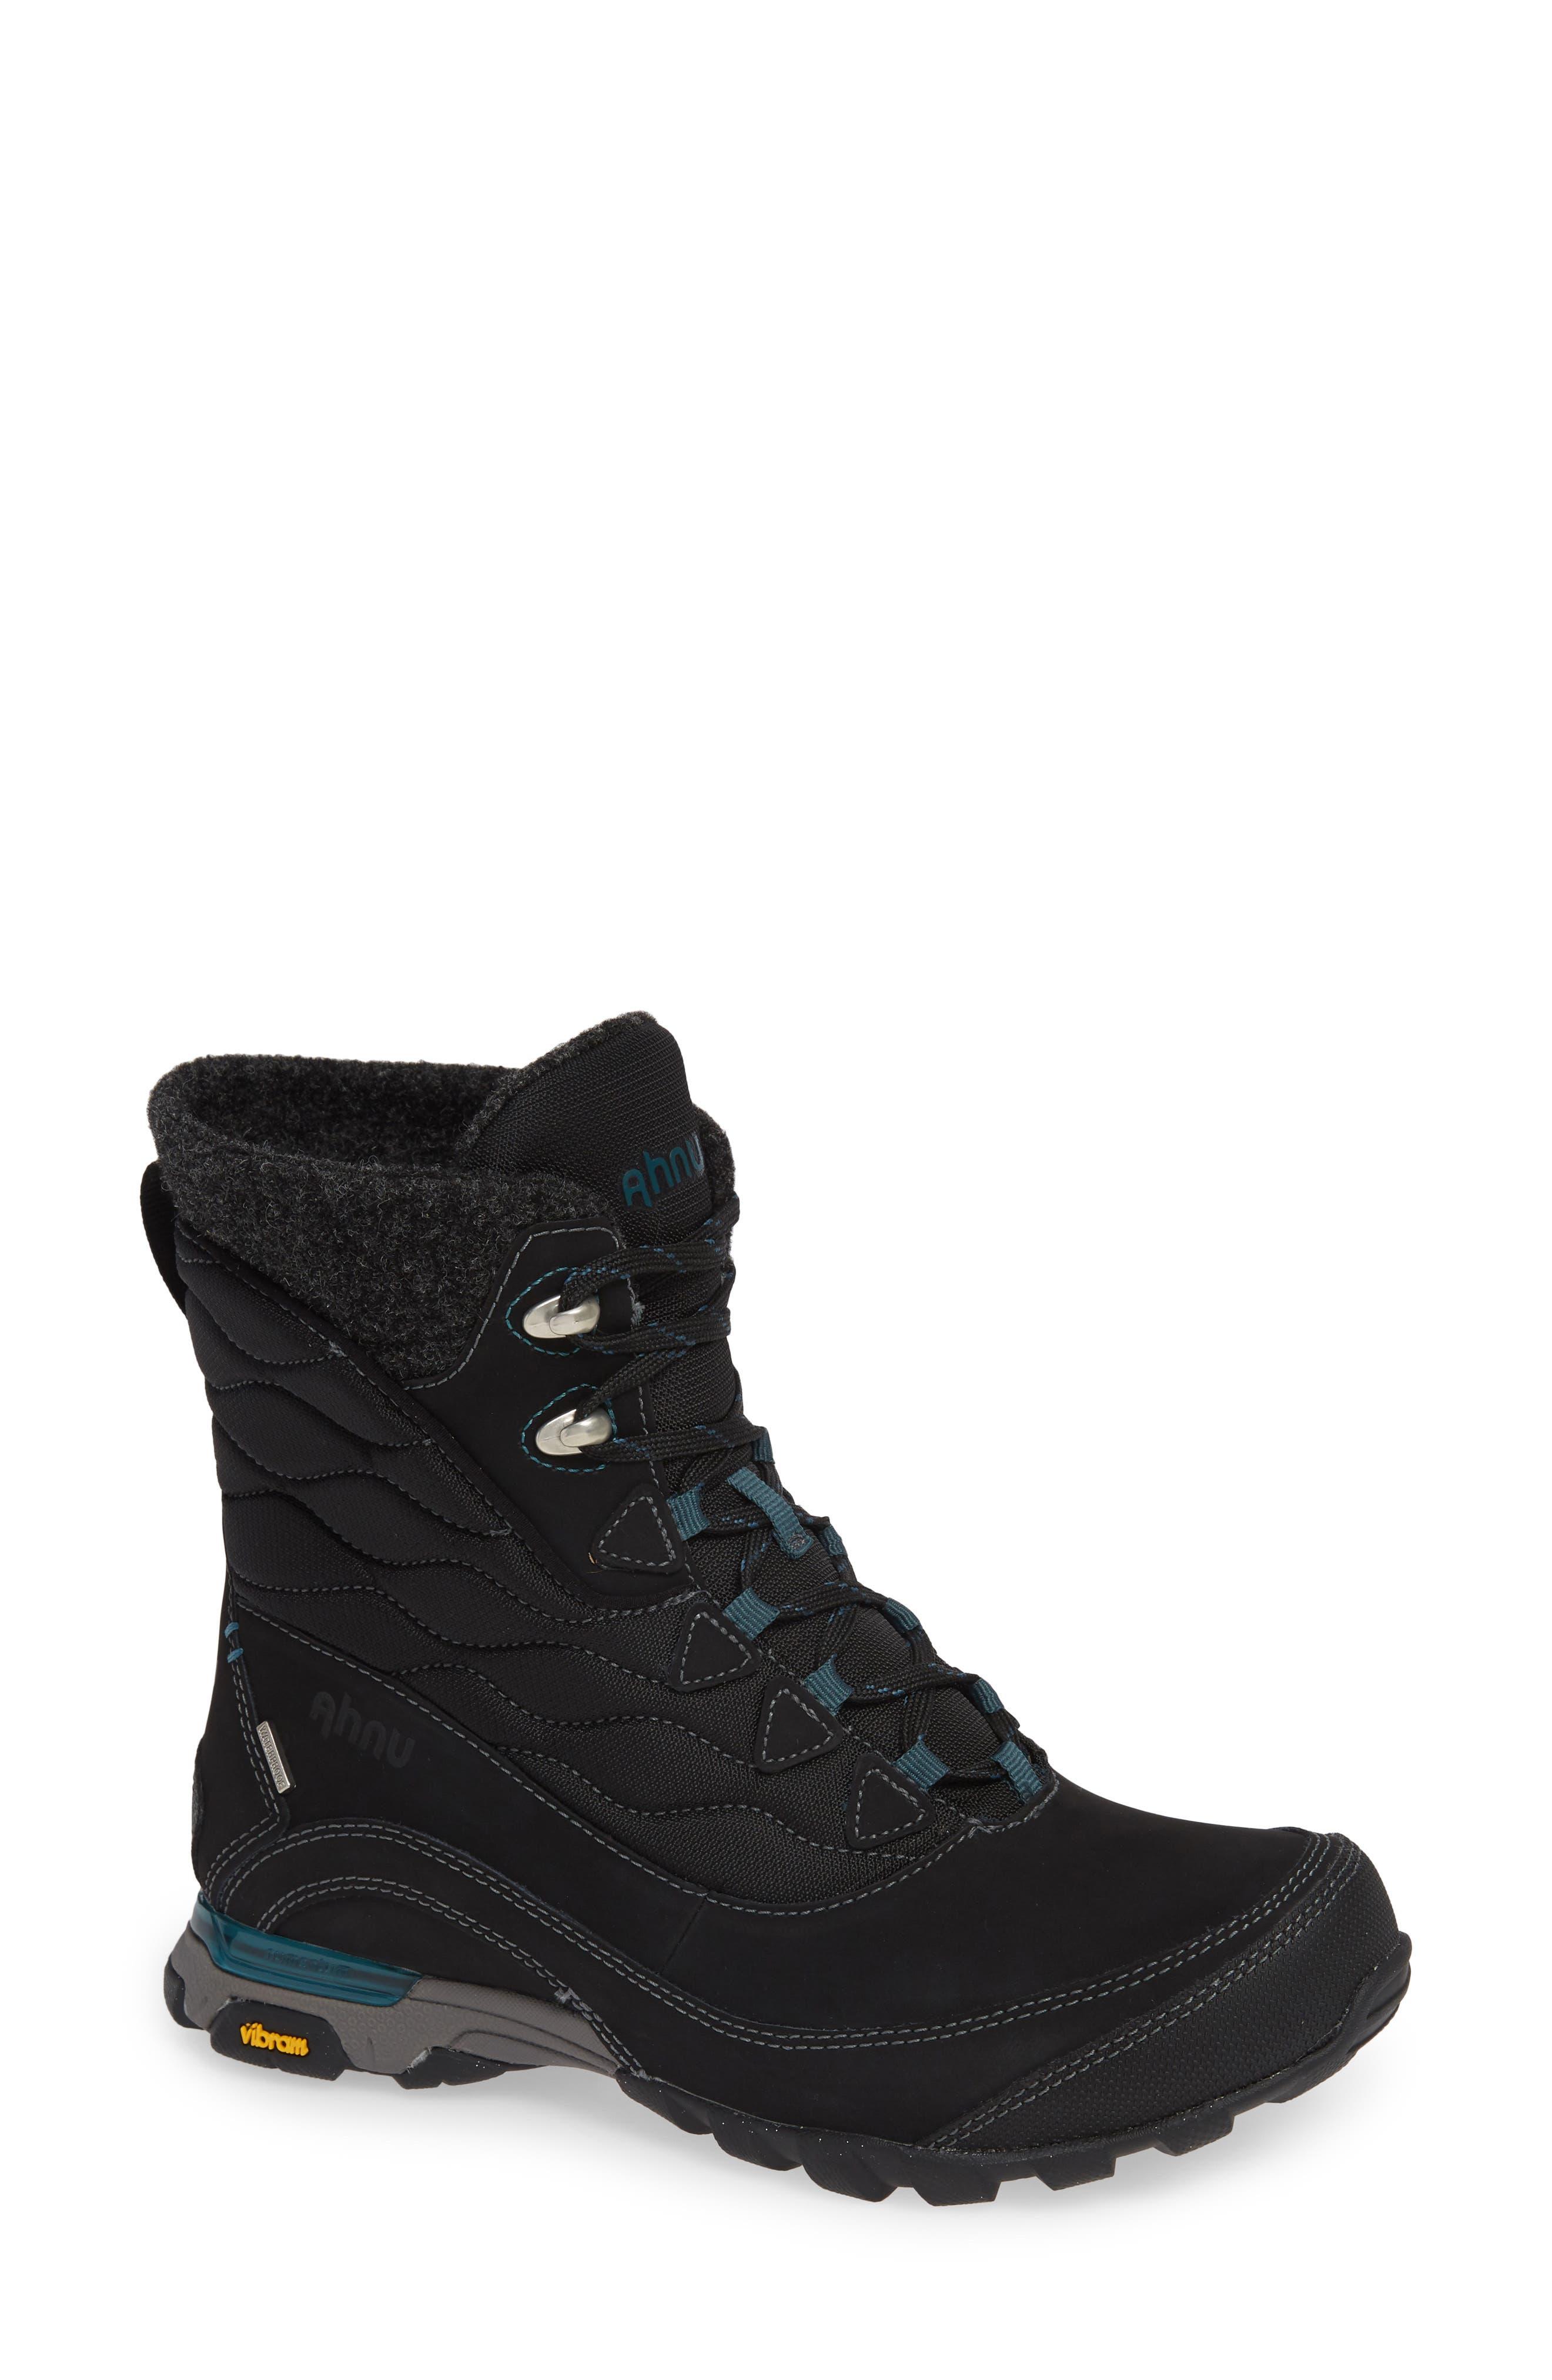 Ahnu By Teva Sugarfrost Insulated Waterproof Boot, Black